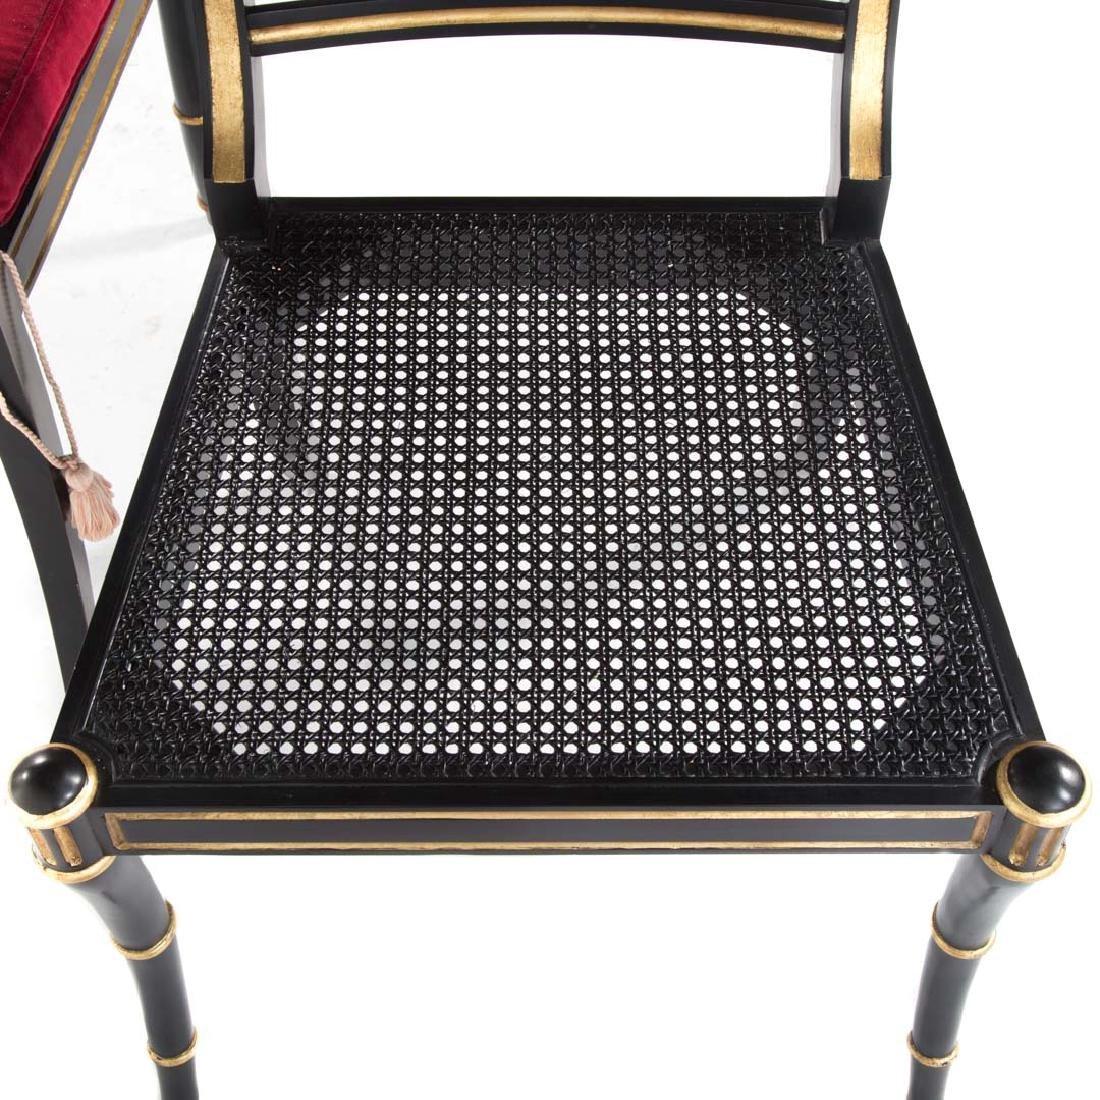 10 Baker Regency style ebonized/gilt dining chairs - 4